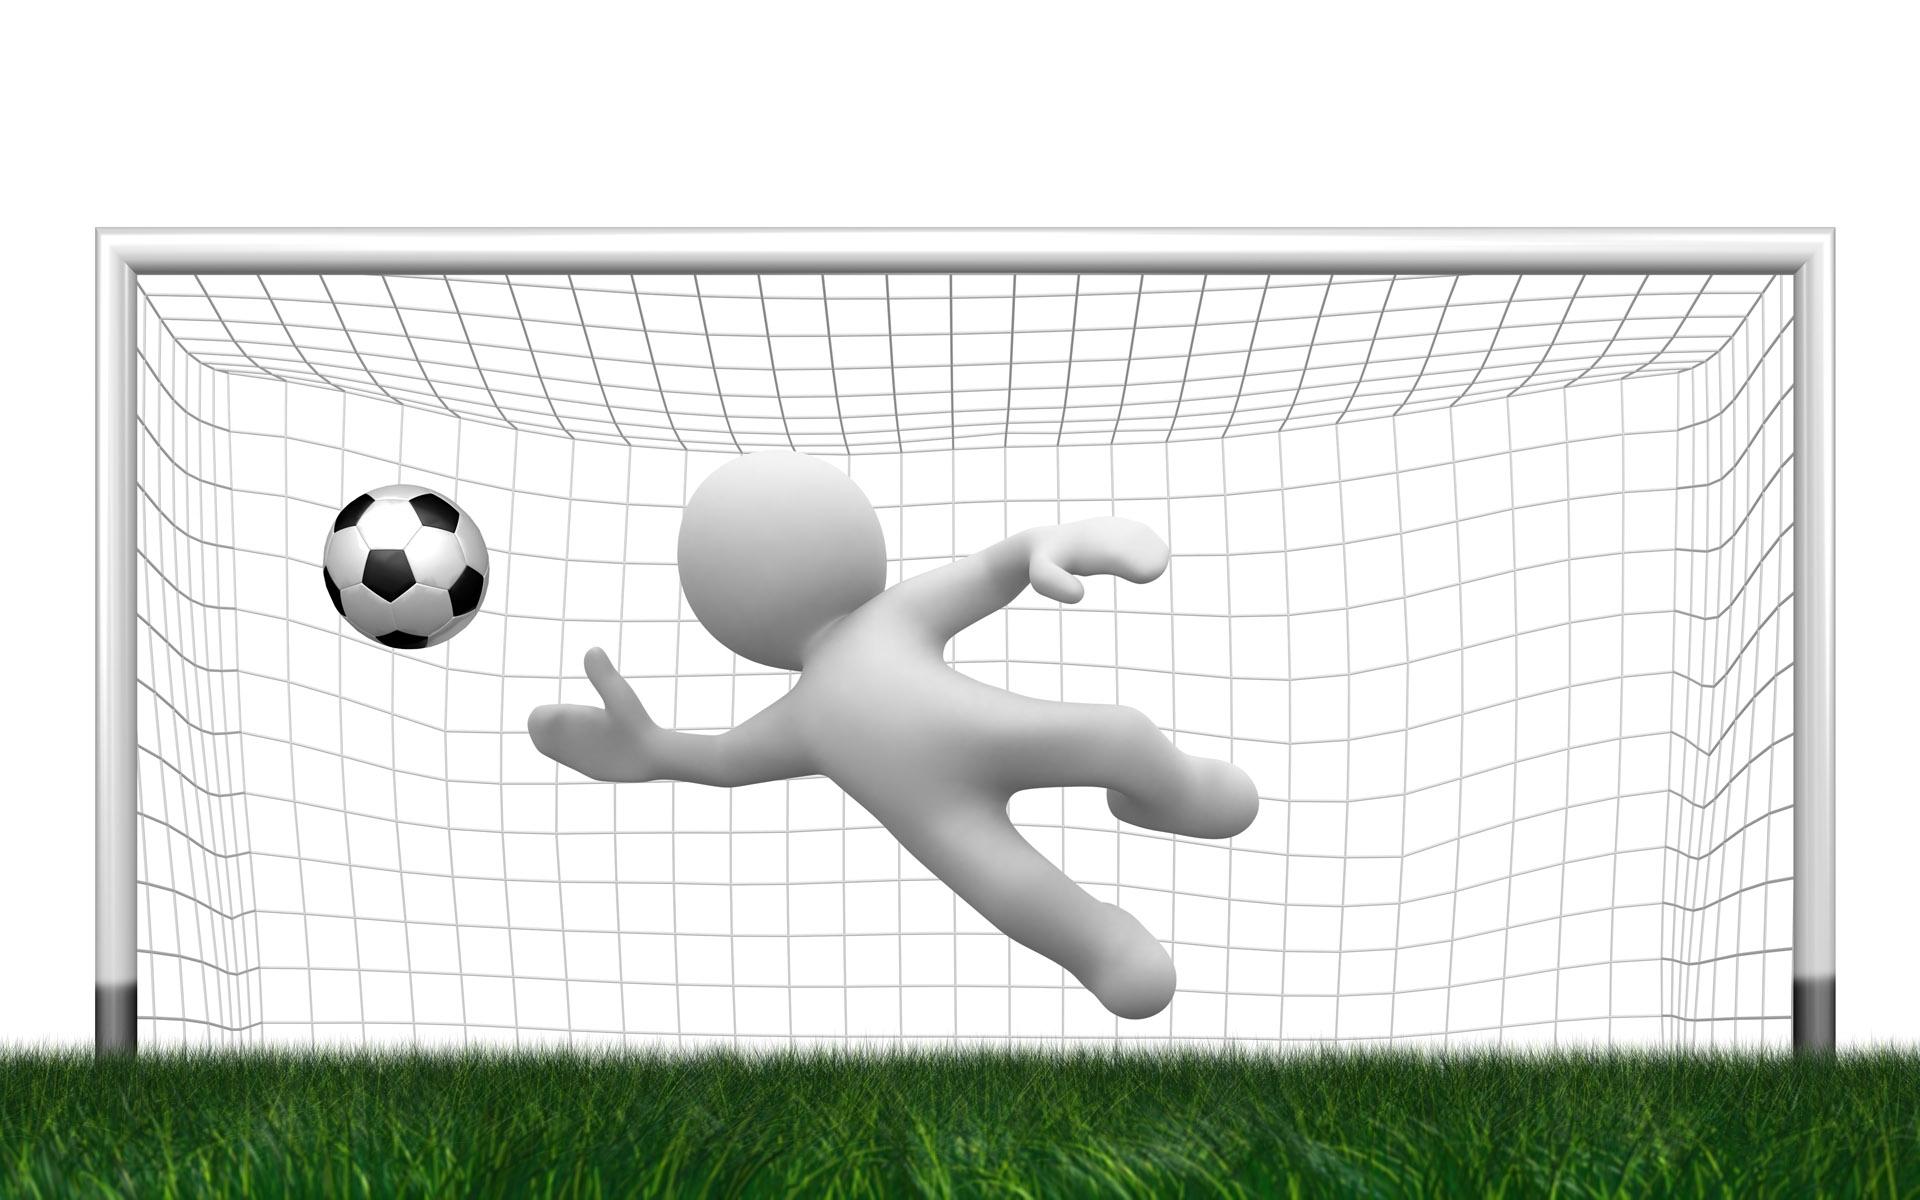 football net clipart - photo #24